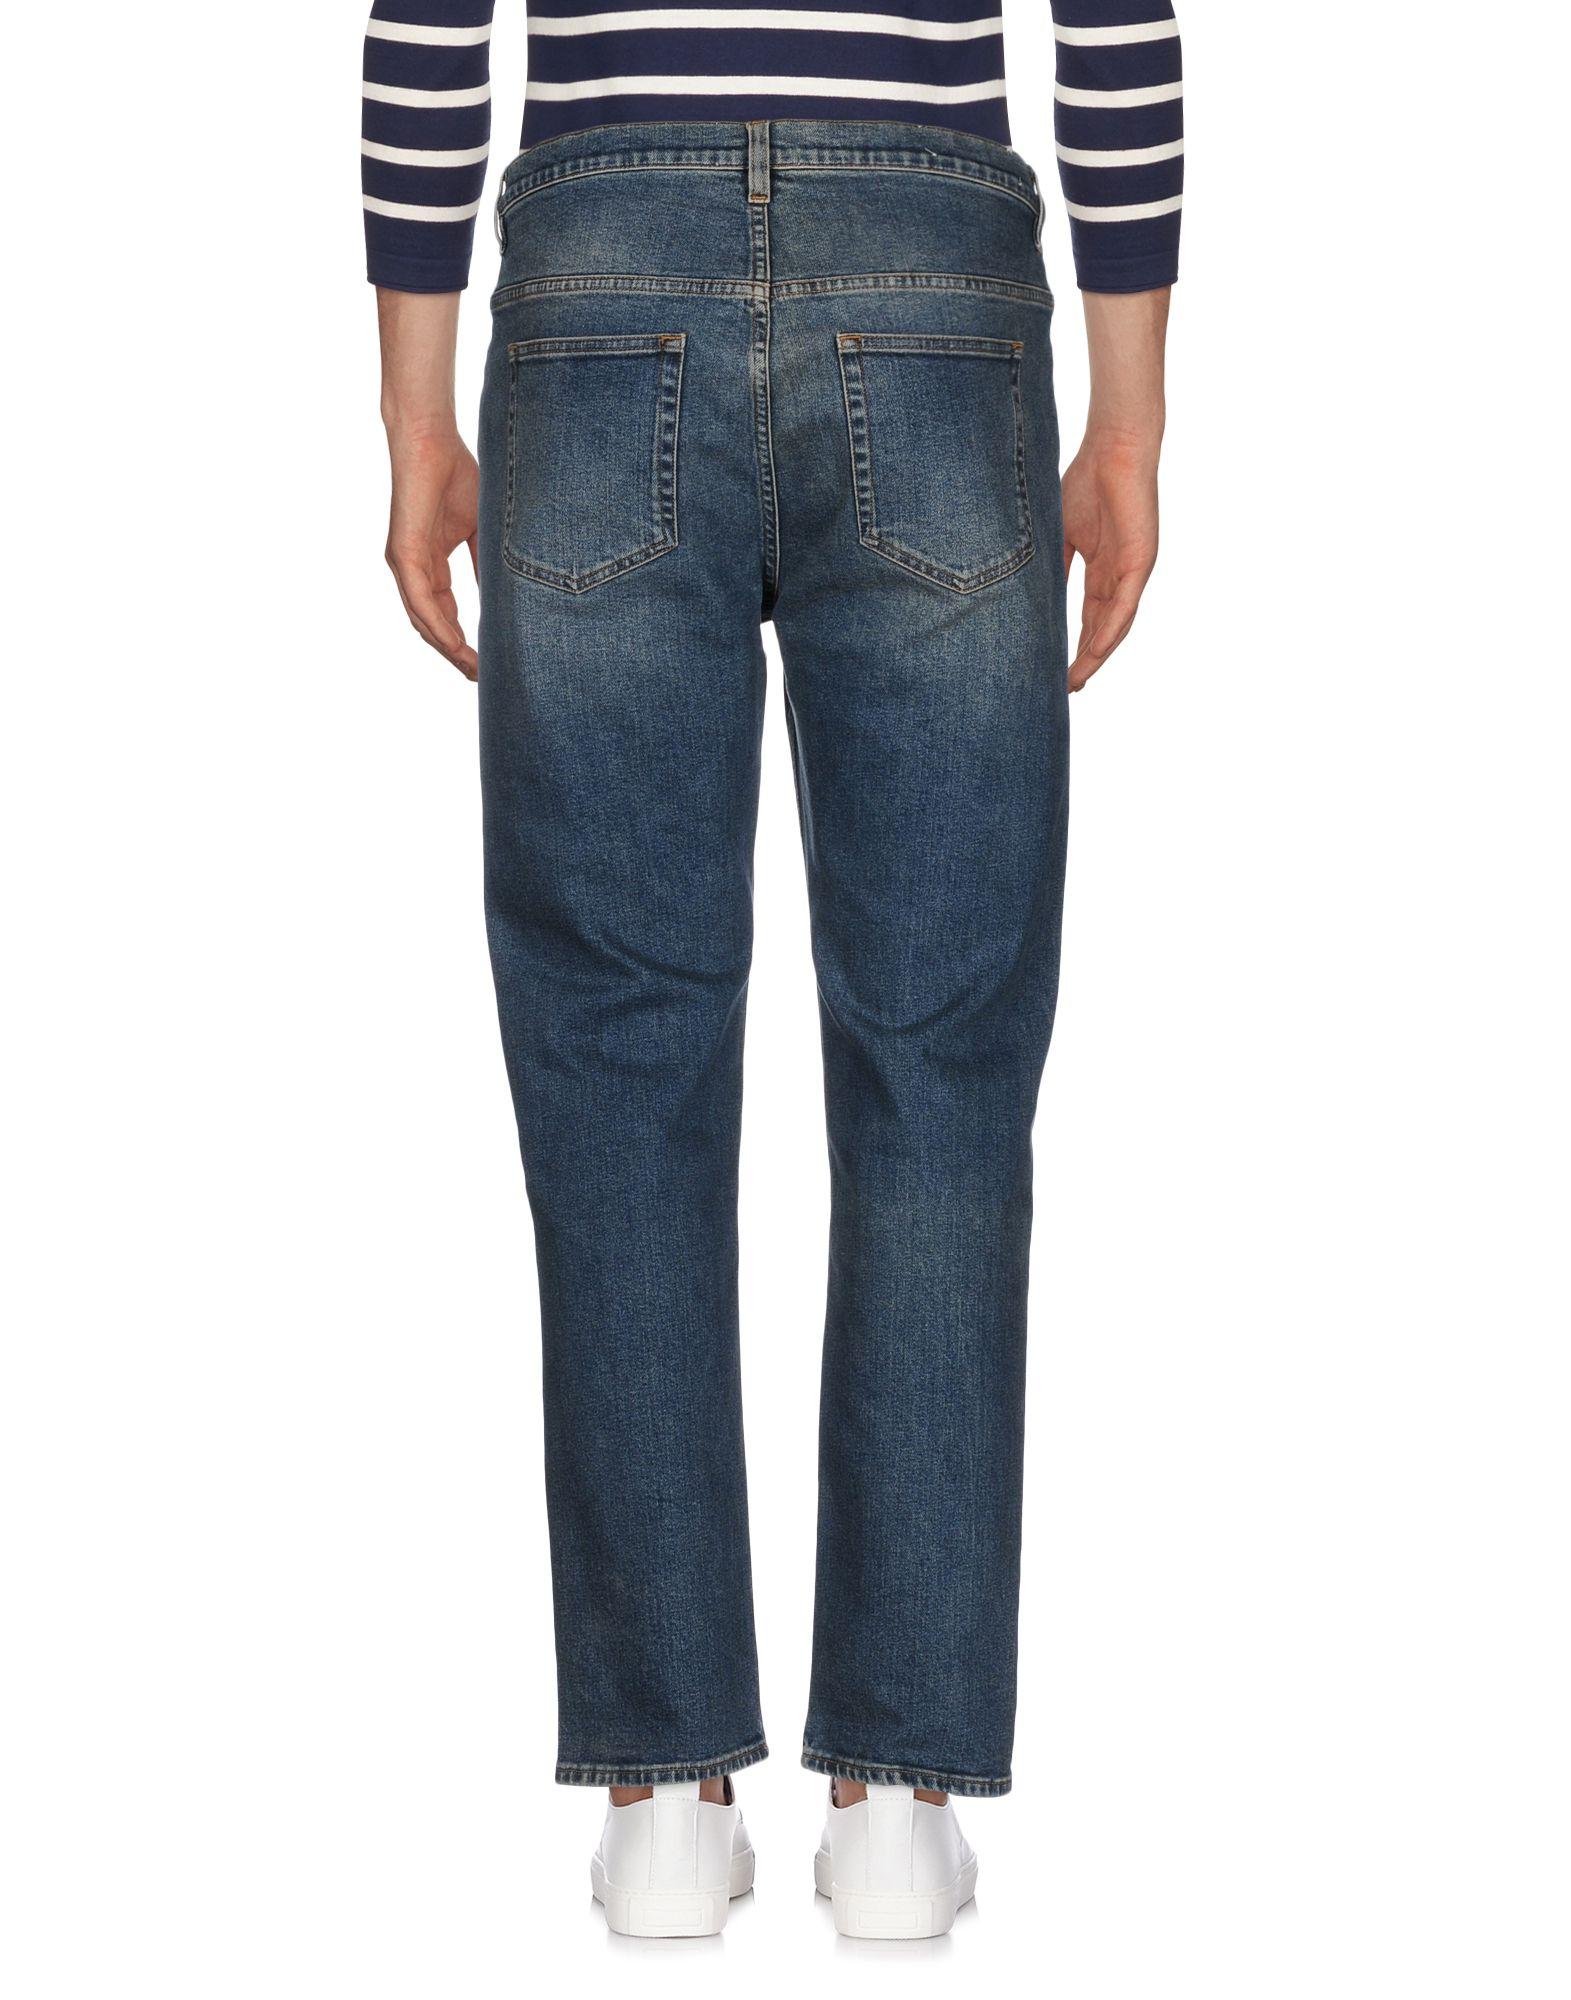 Pantaloni Jeans Acne Studios Uomo 42645682PT - 42645682PT Uomo 74caa5